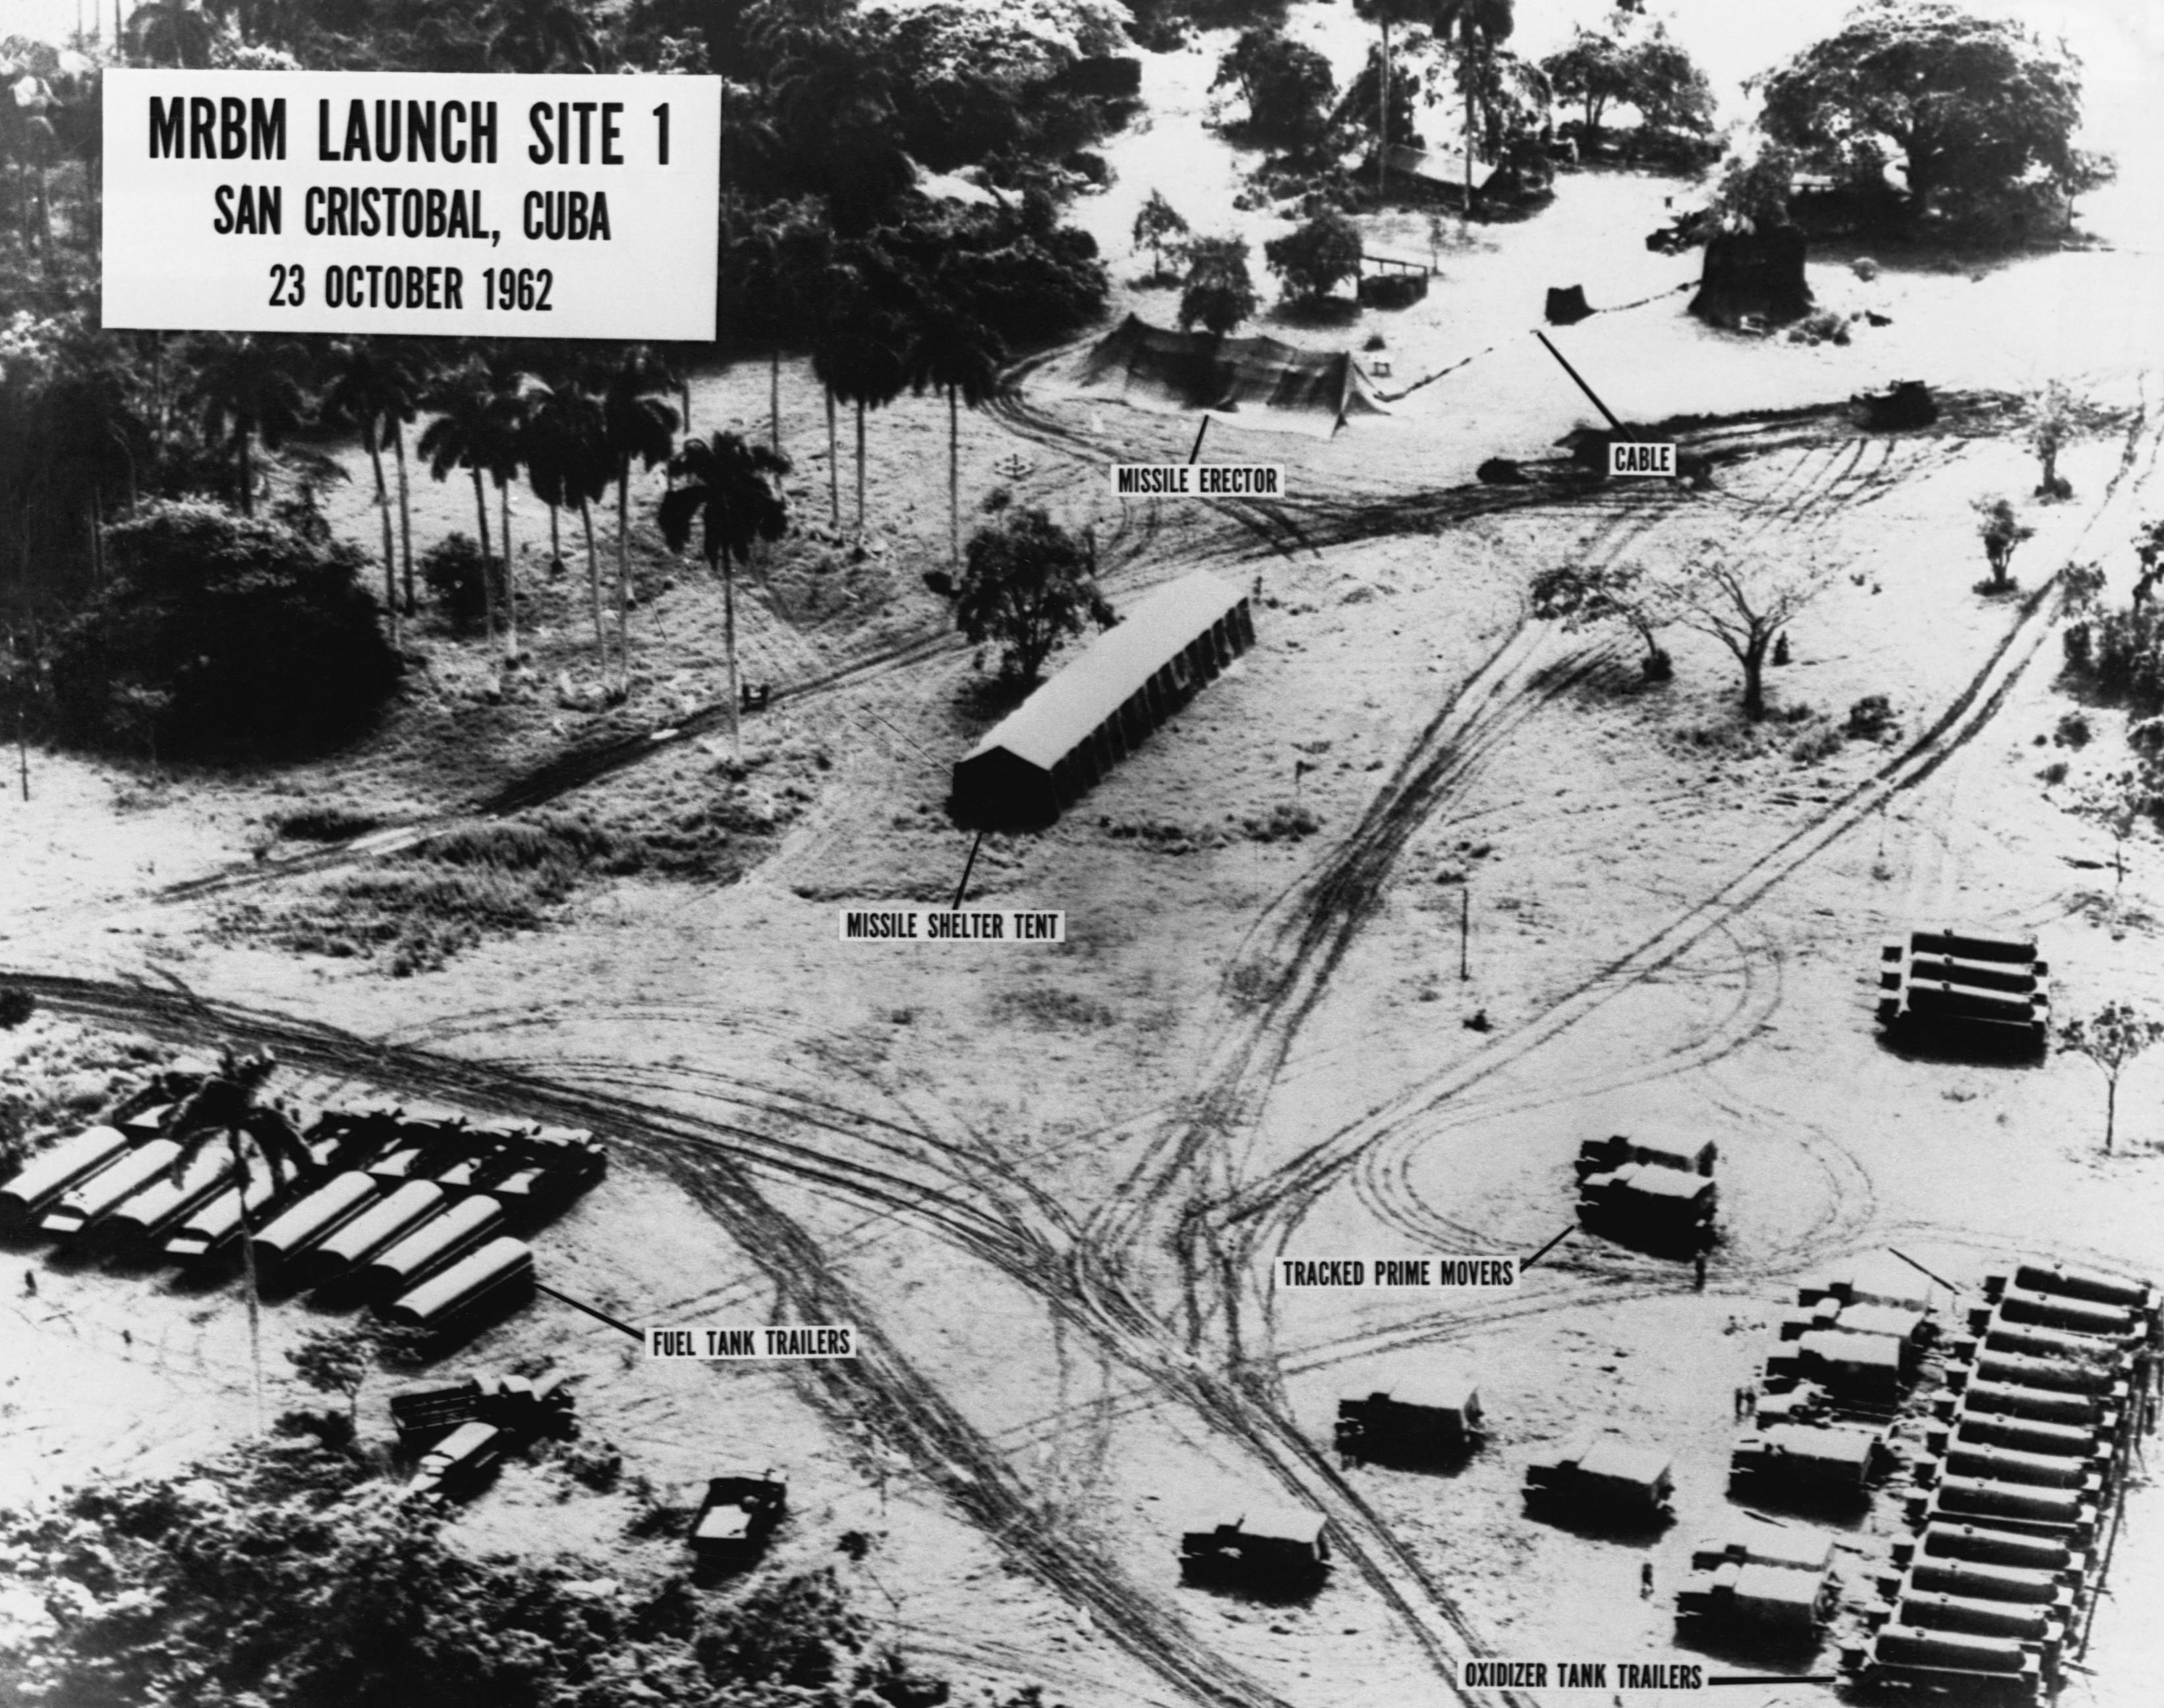 n missile crisis pictures n missile crisis com 14 1962 missile erectors n missile crisis mrmb launch